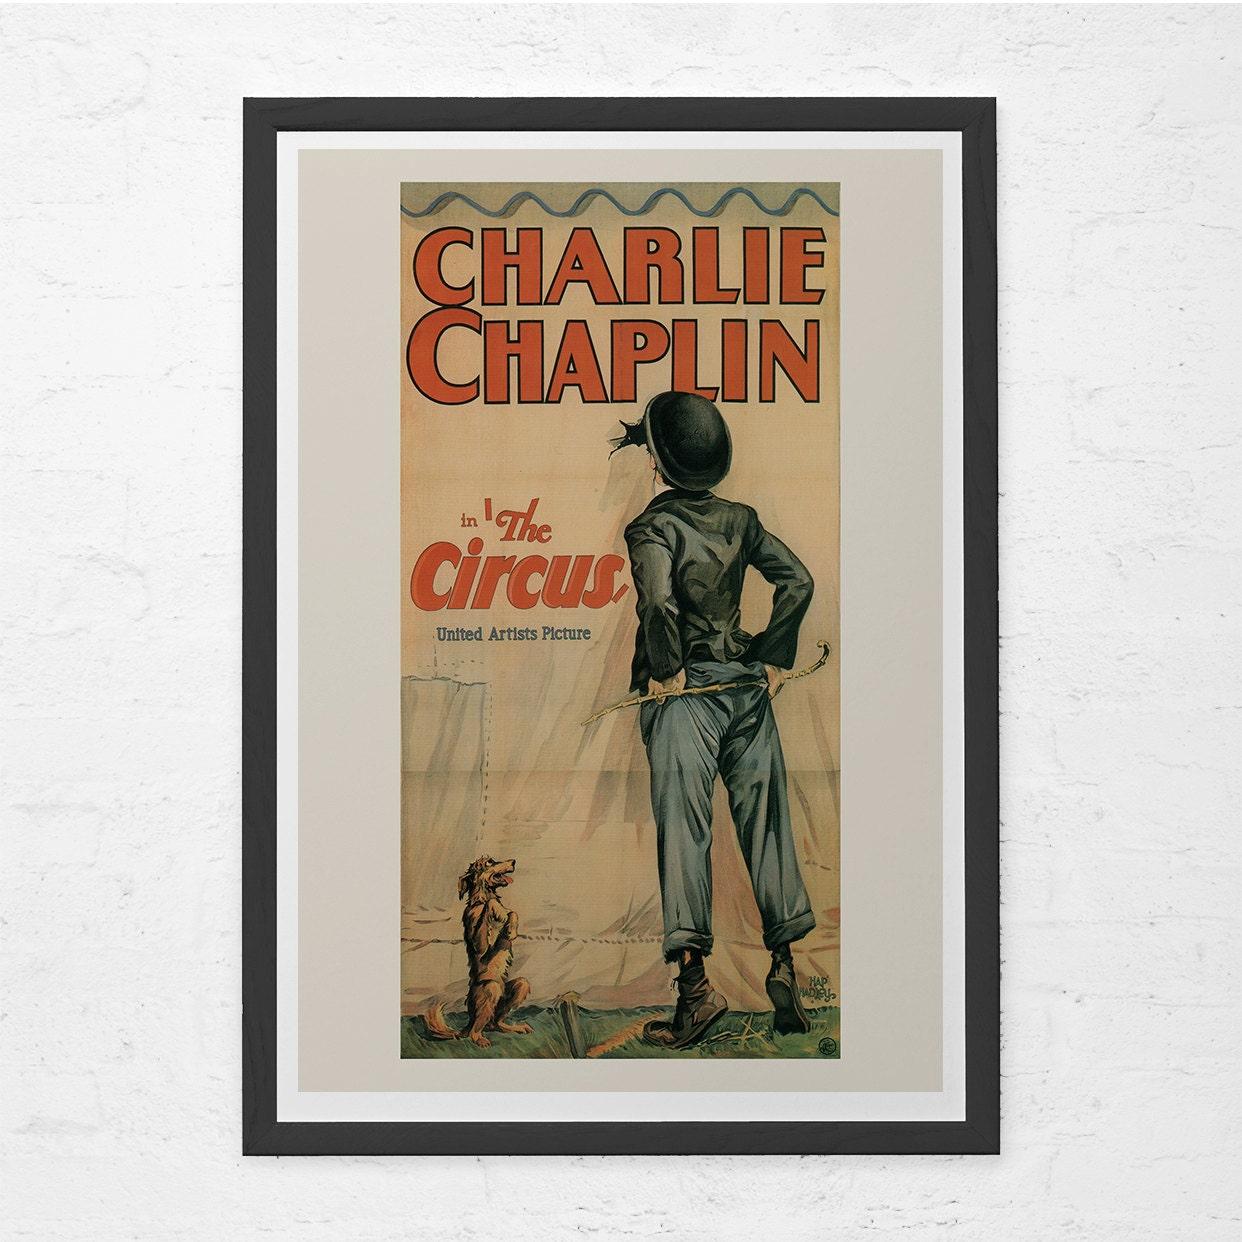 CLASSIC FILM POSTER Charlie Chaplin Poster Chaplin The